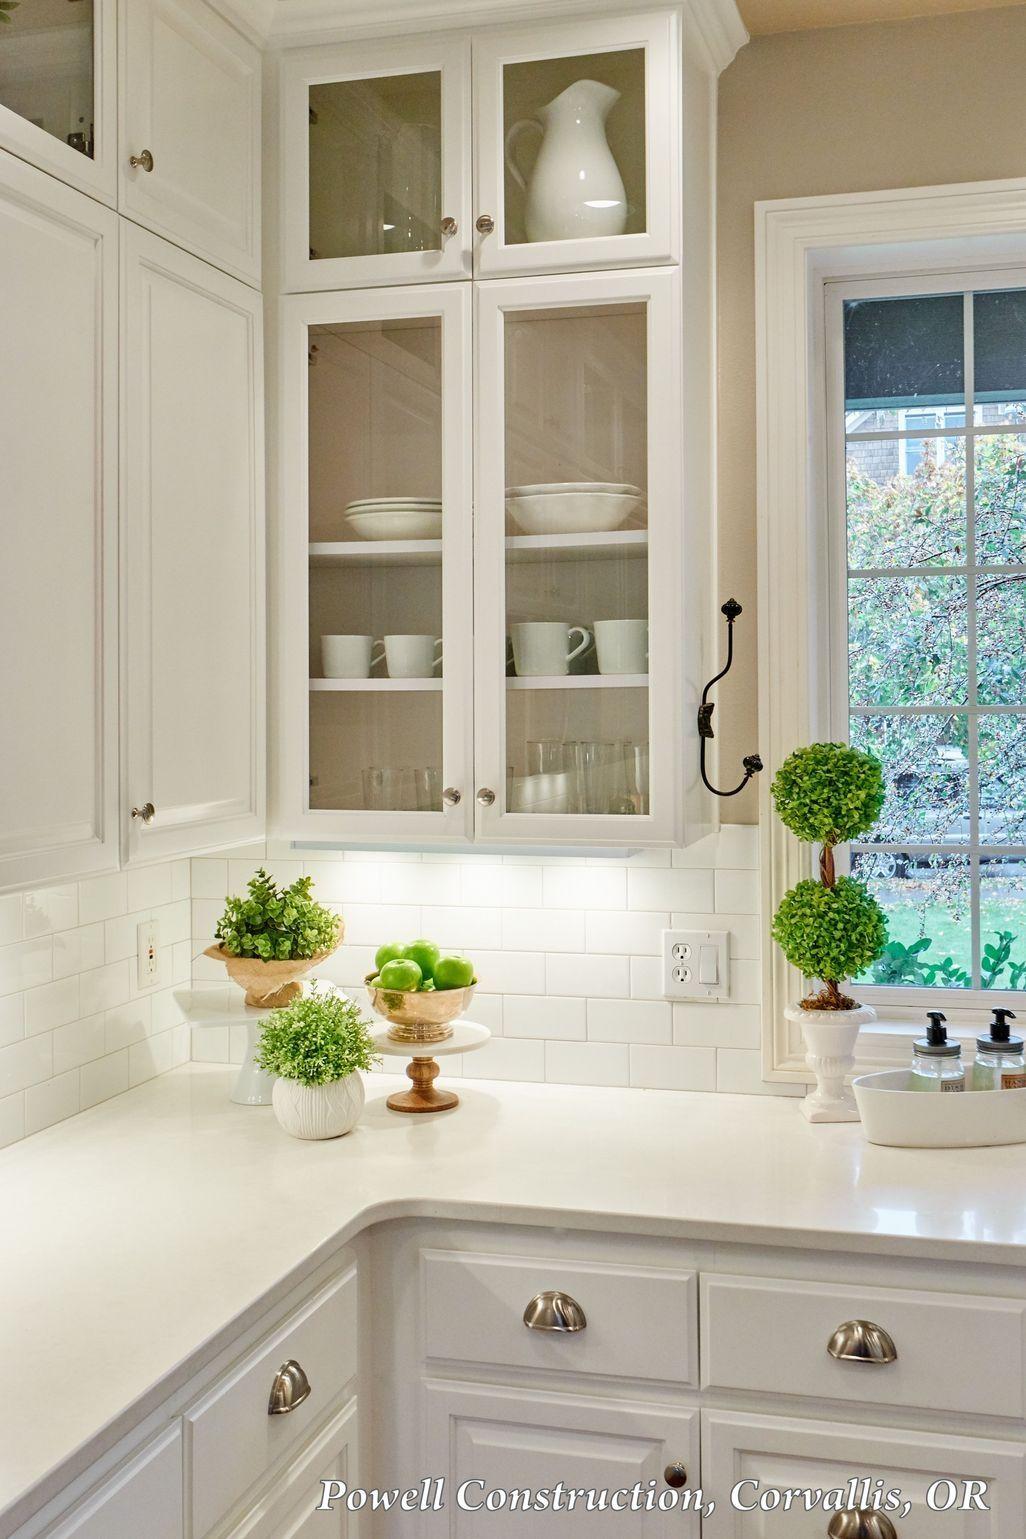 50 Stylish White Kitchen Cabinets Decor Ideas   50homedesign.com